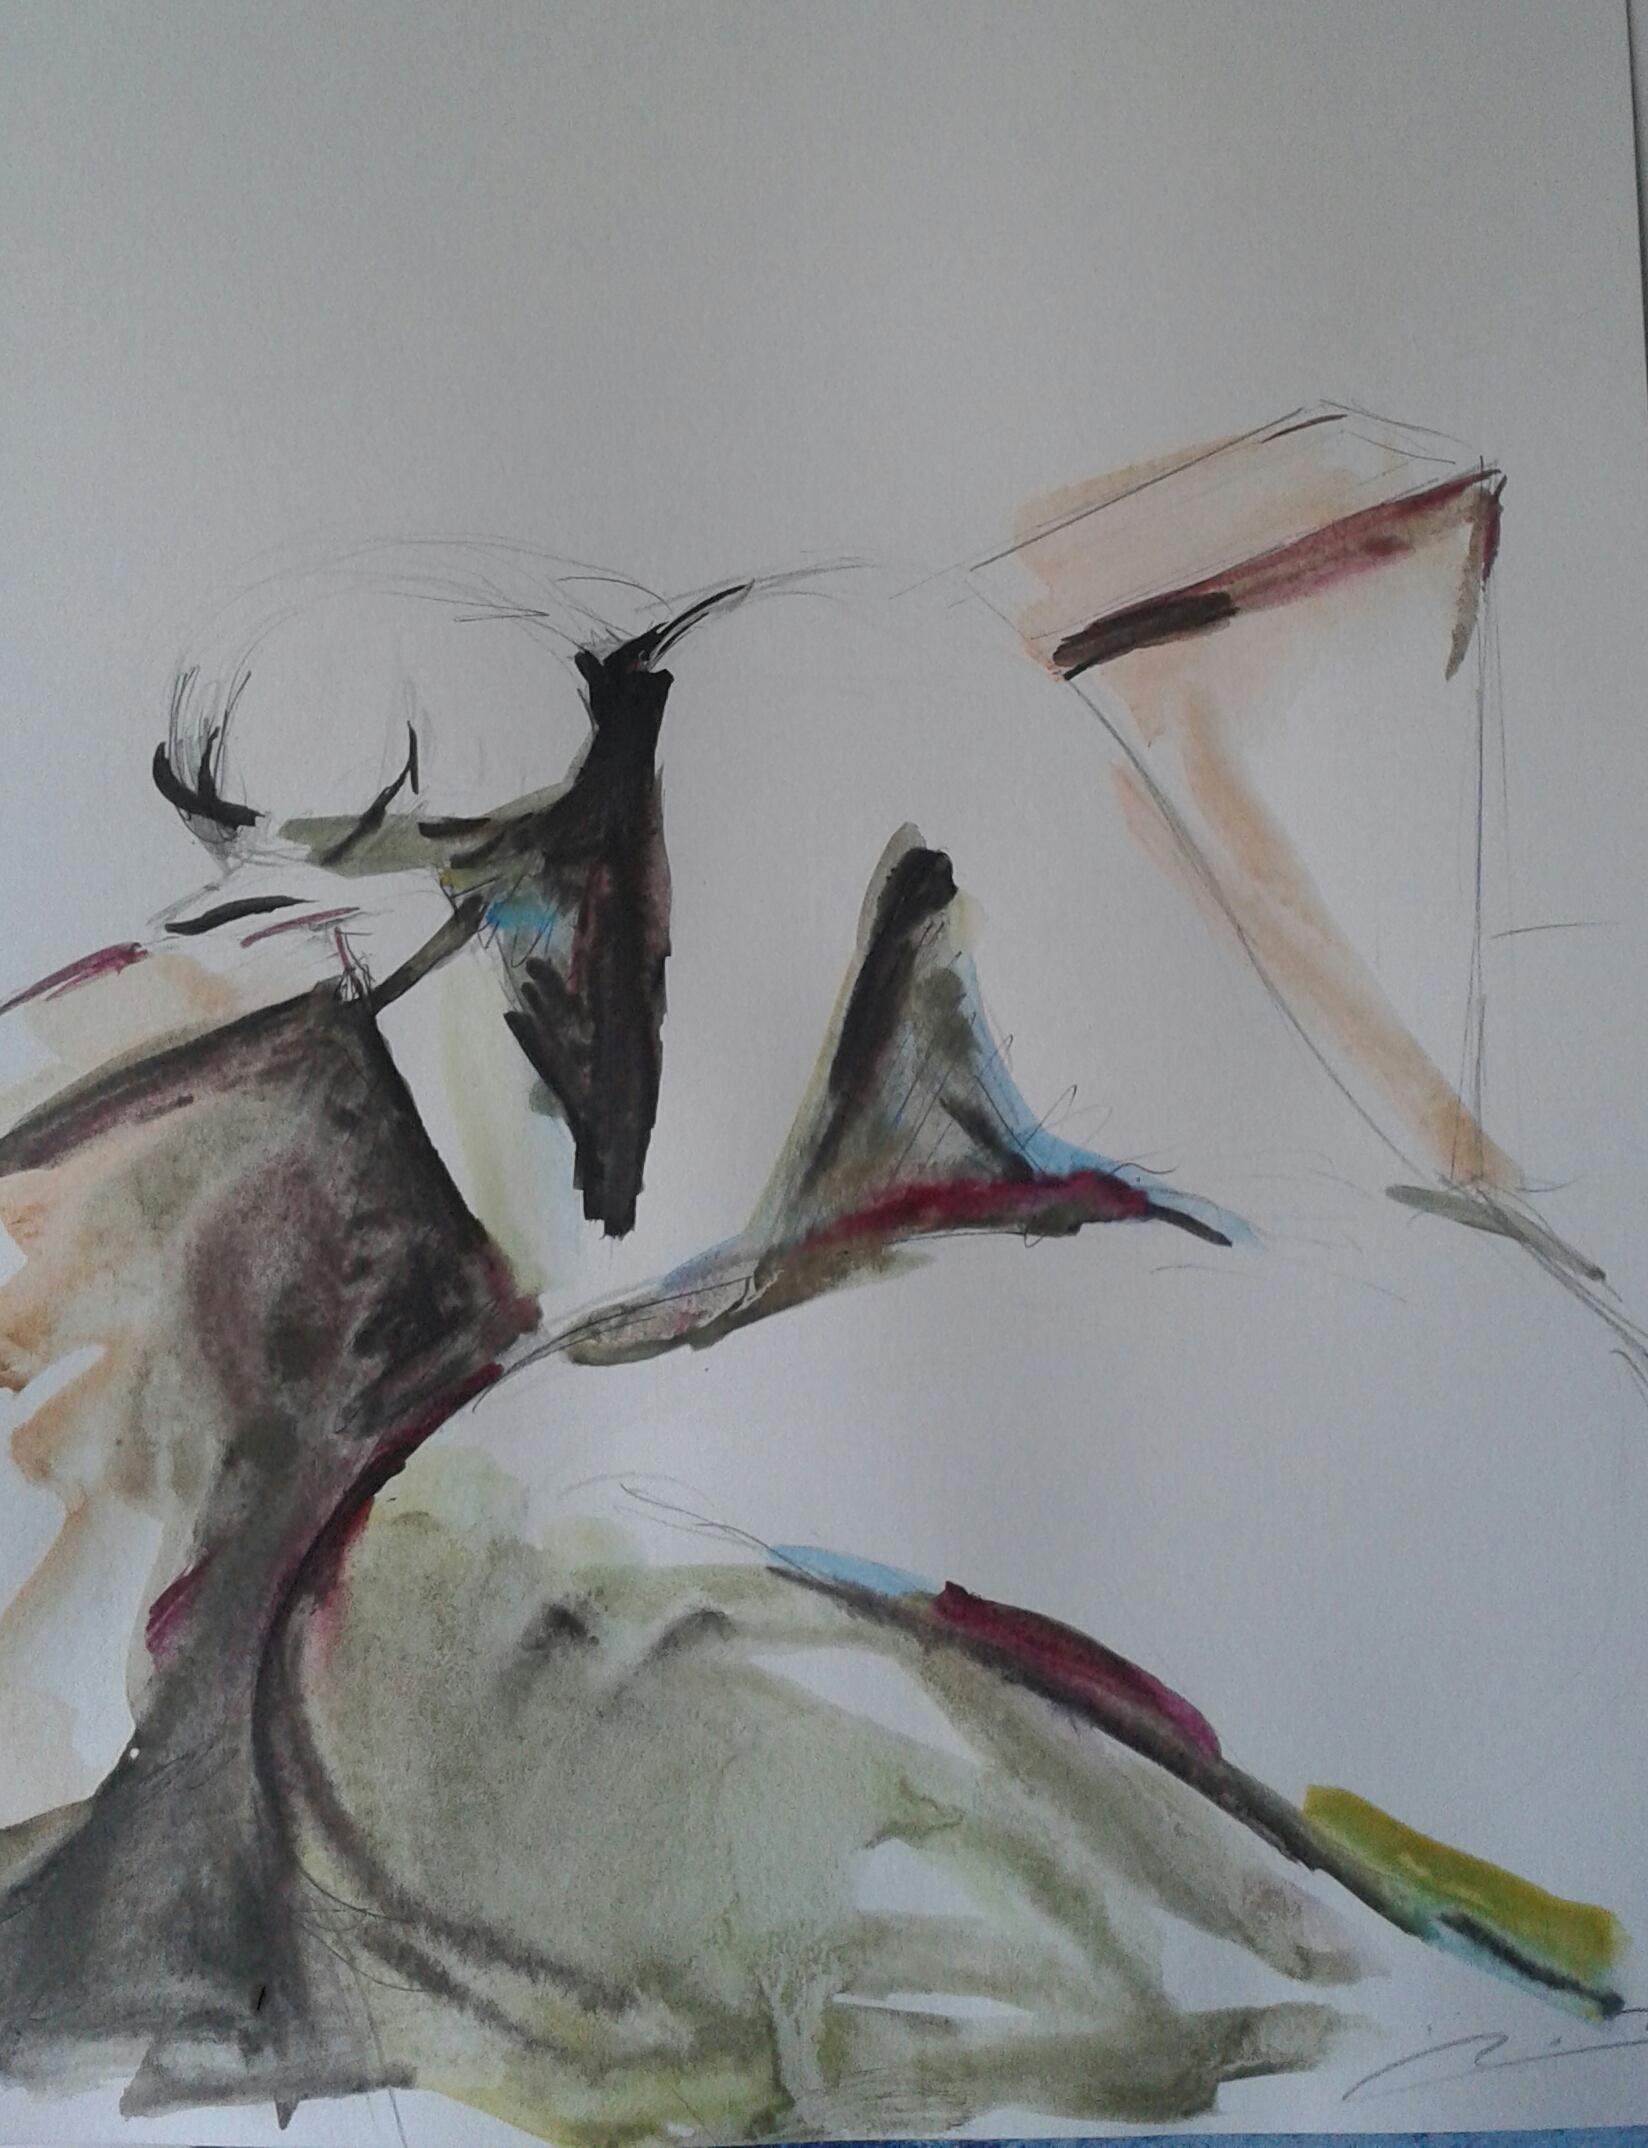 Artwork from the book - צפת – זיכרונות – ציפורה בראבי by tsipi baravi - Illustrated by ציפורה בראבי - Ourboox.com